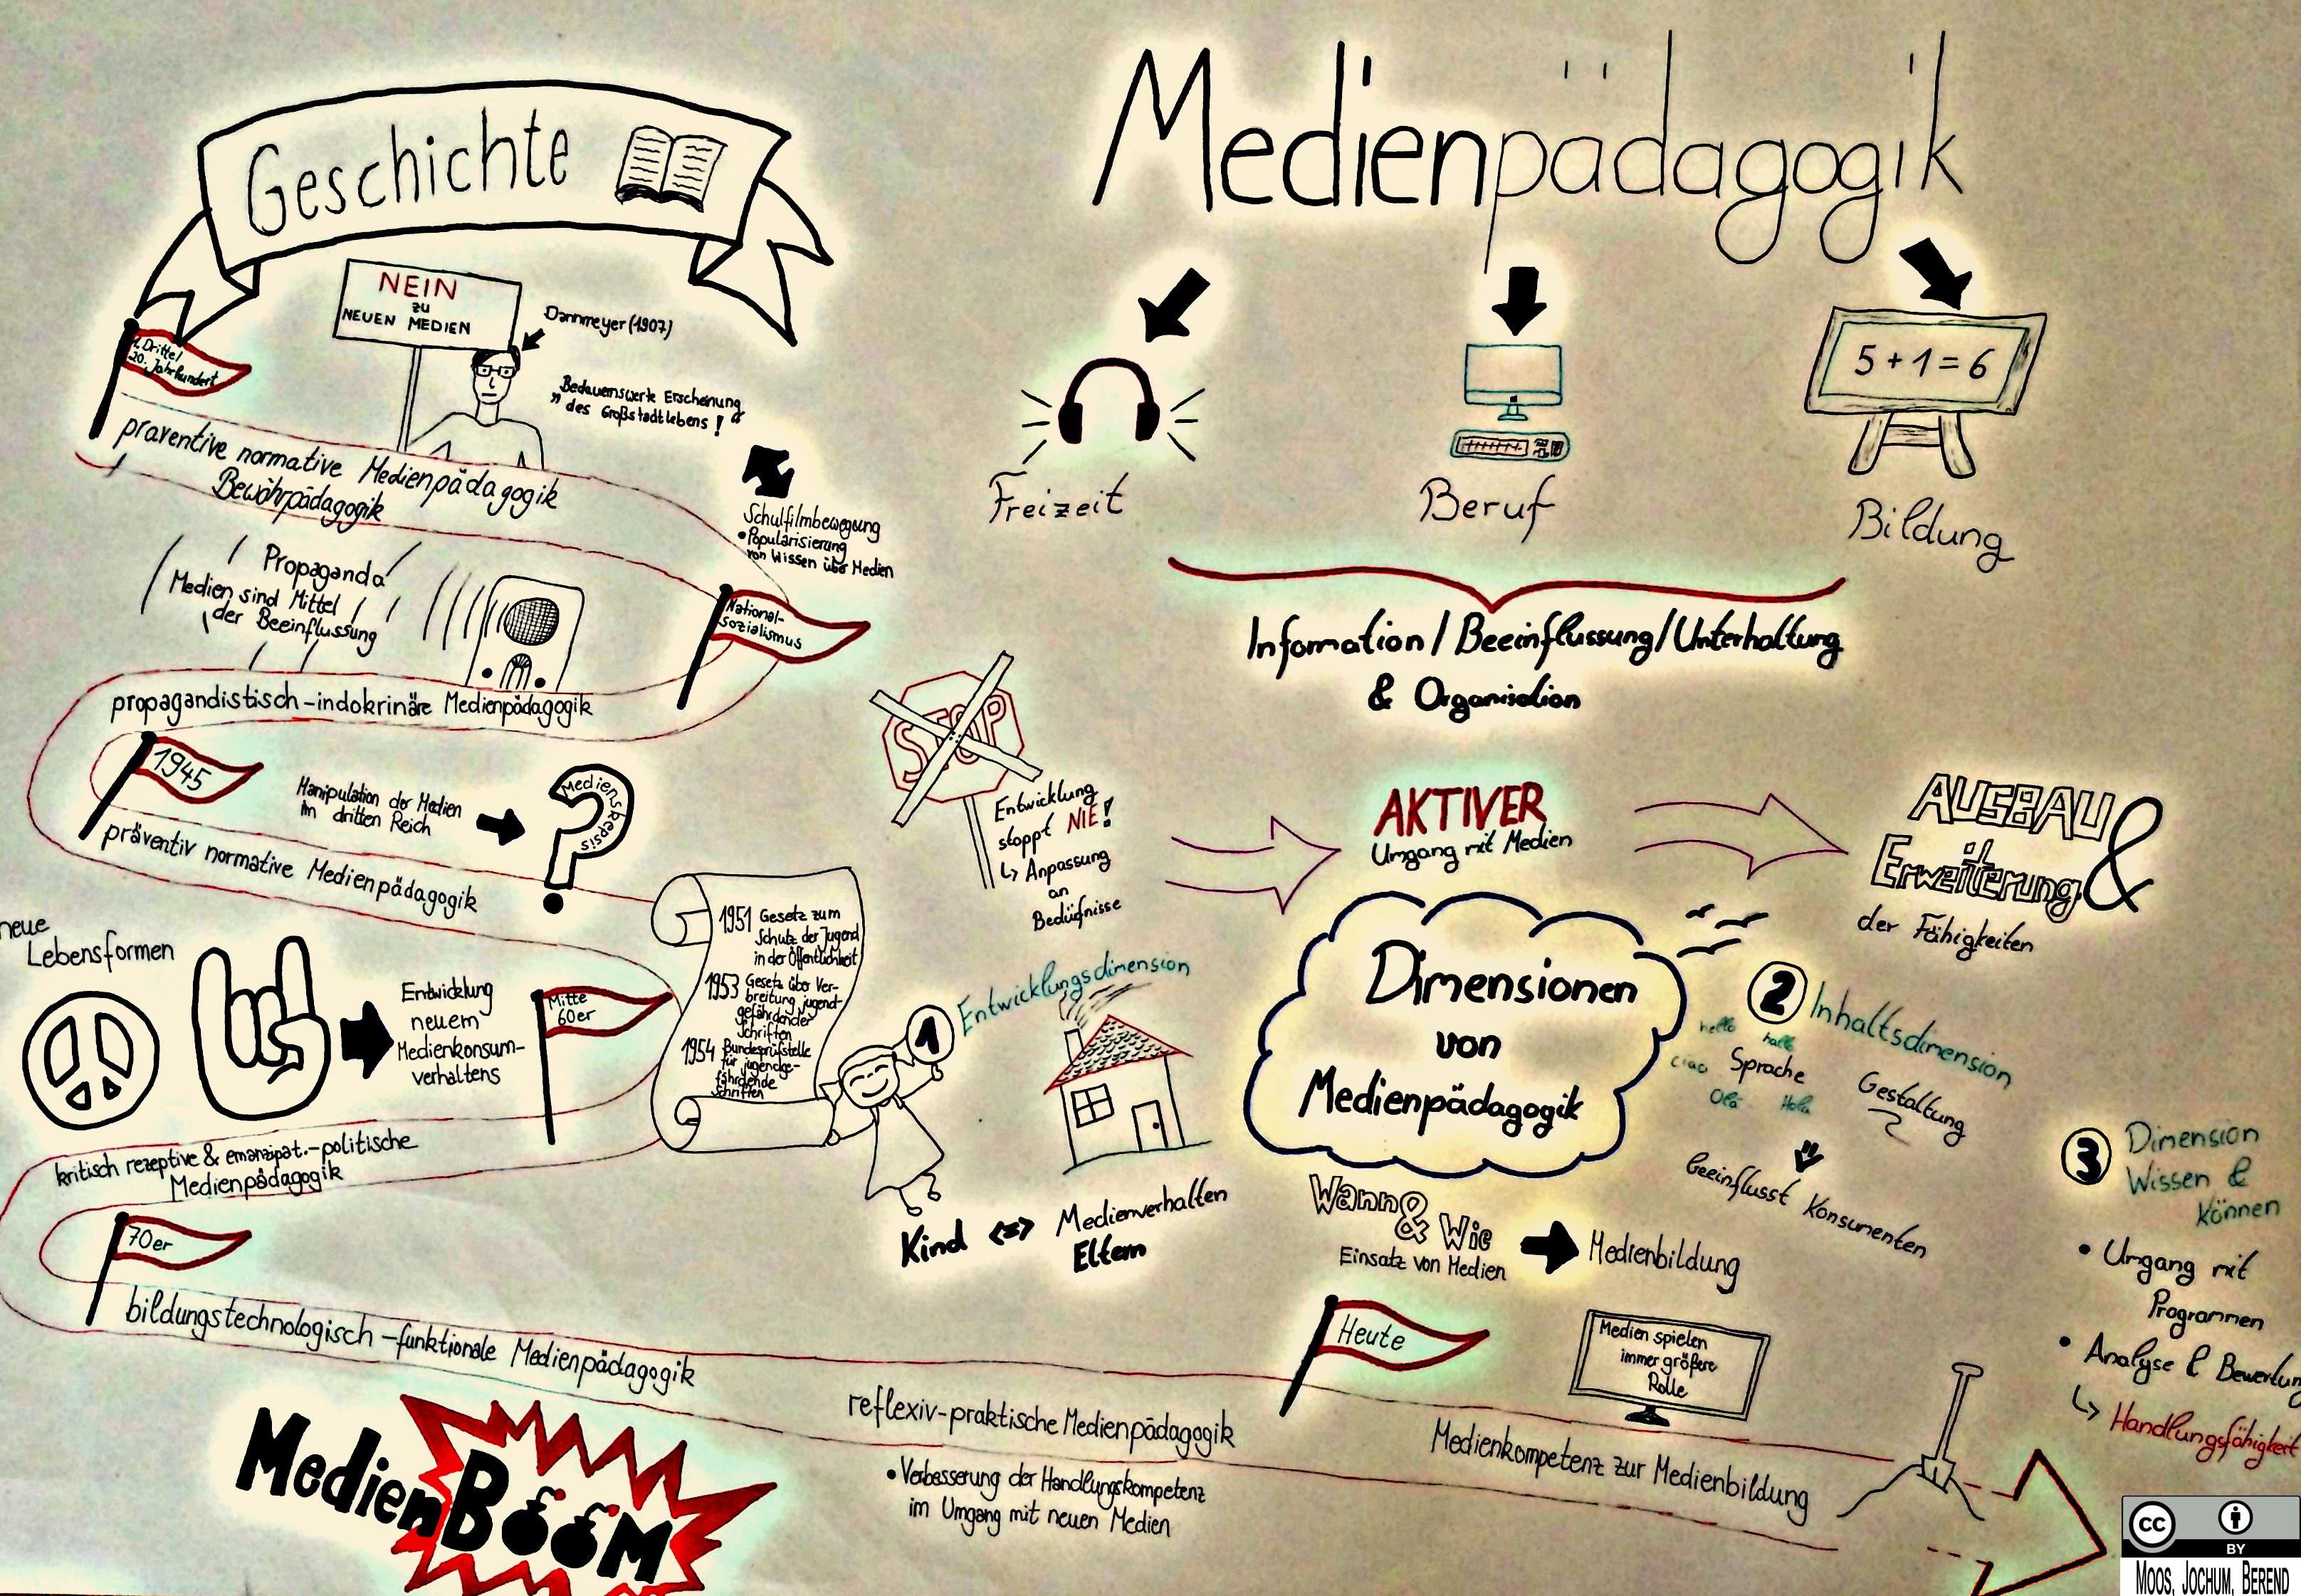 Medienpädagogik – Wikipedia